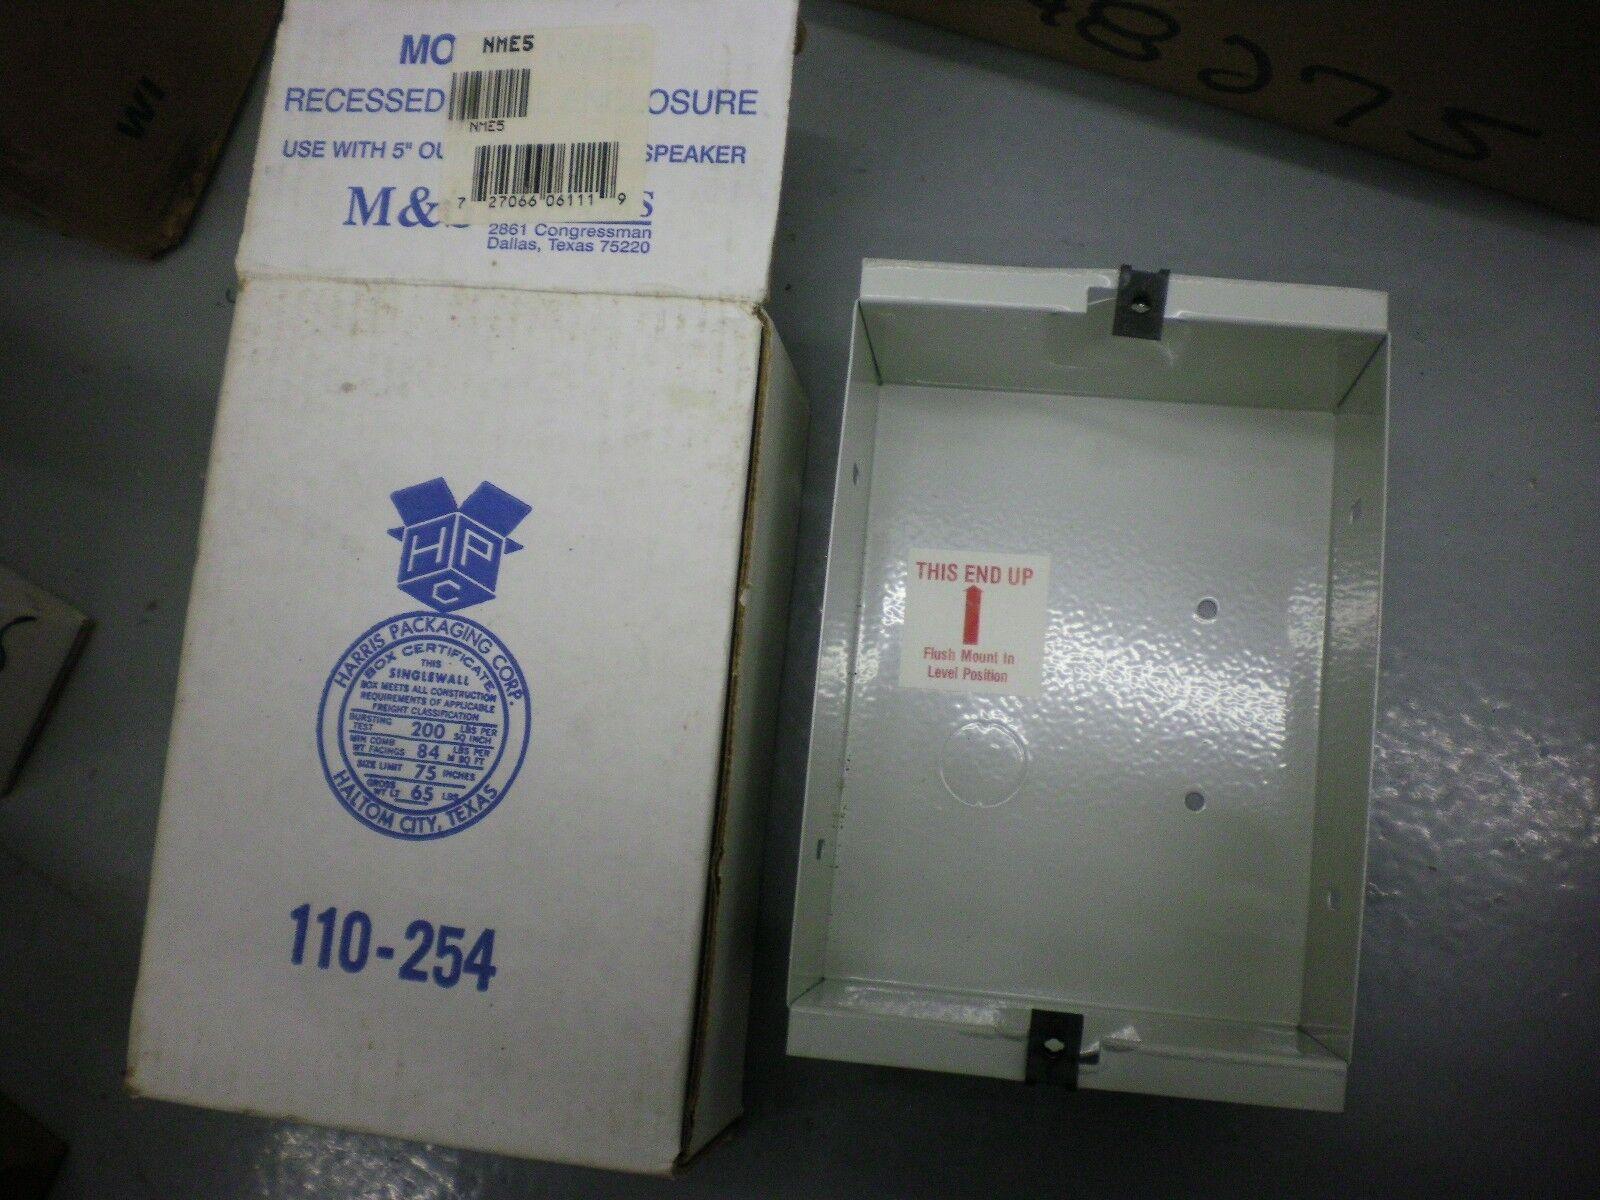 "M & S Systems Intercom System NME5 Outdoor Speaker Enclosure for 5"" Speaker NIB"